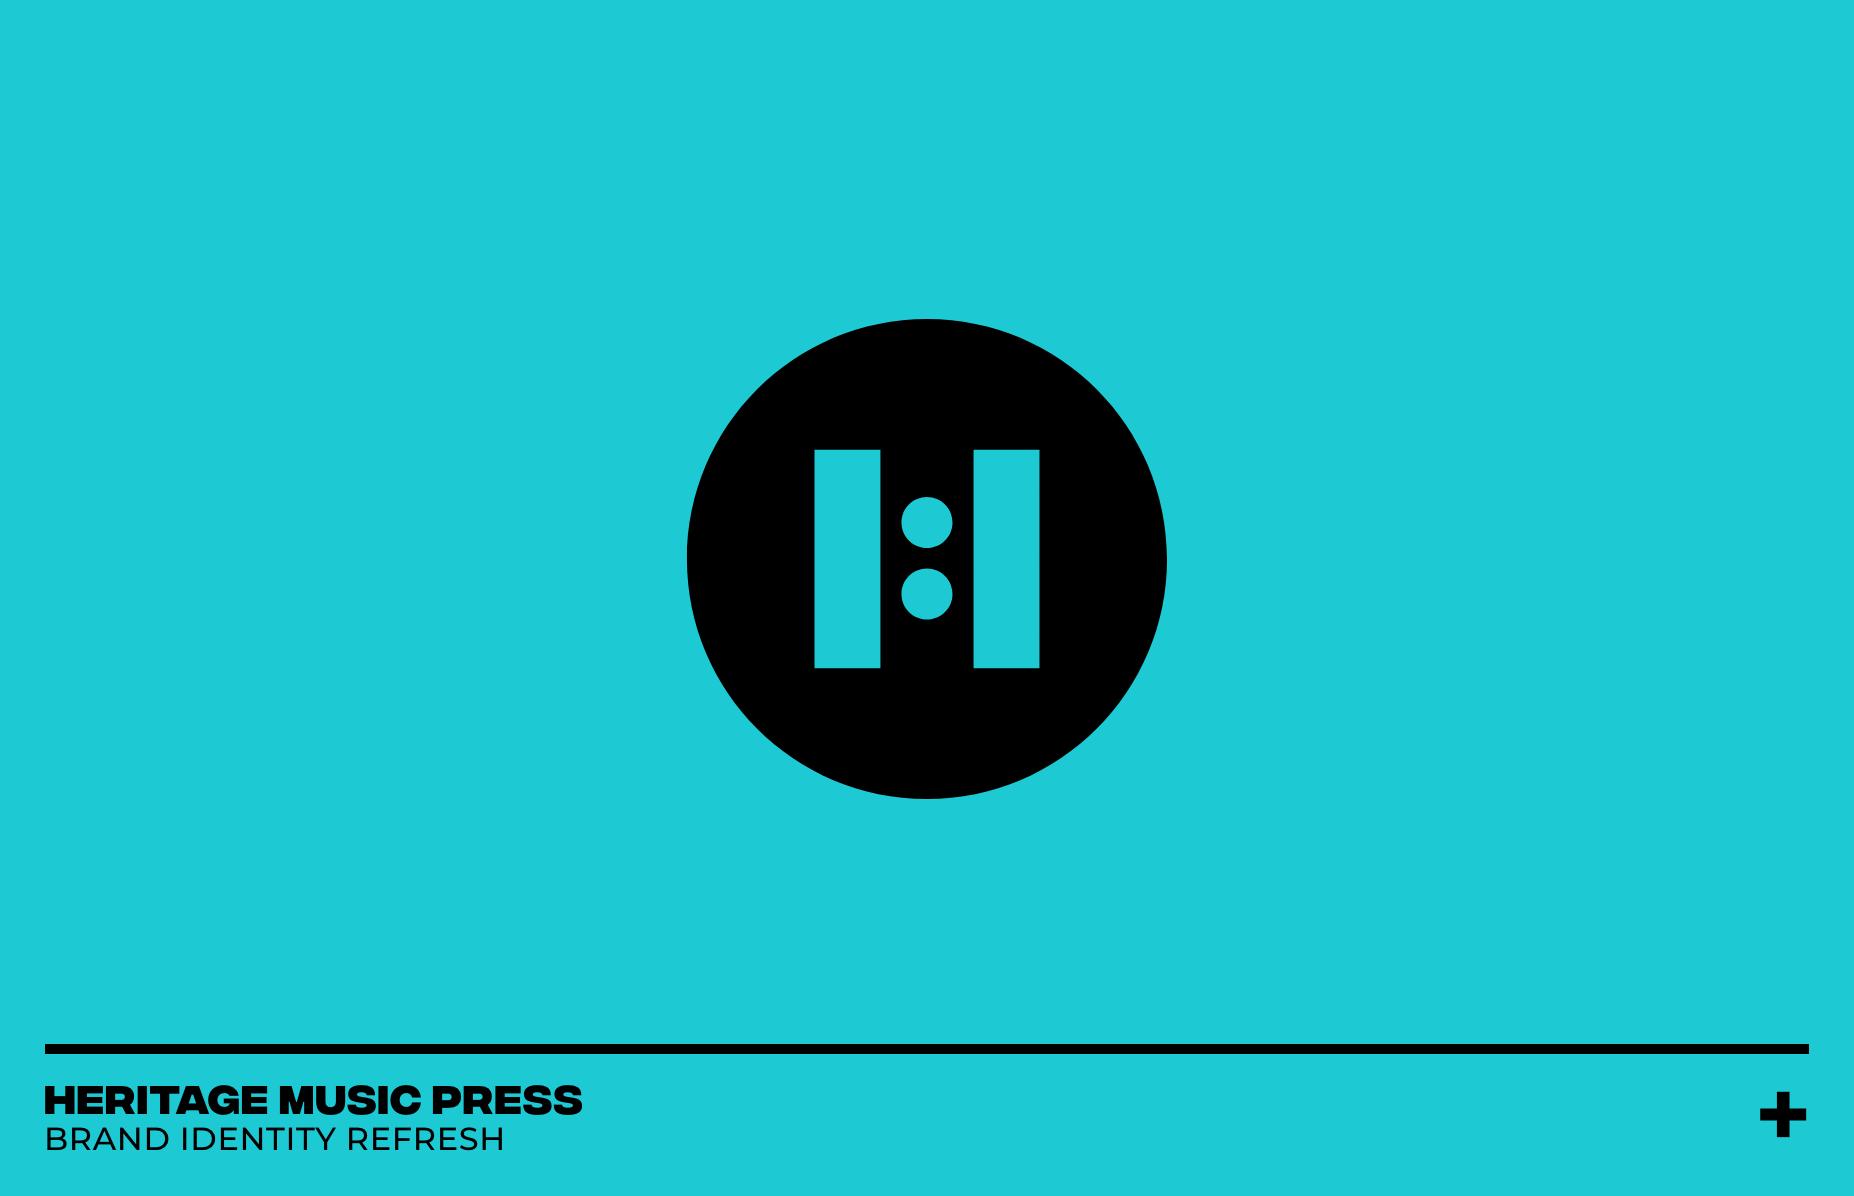 Heritage Music Press